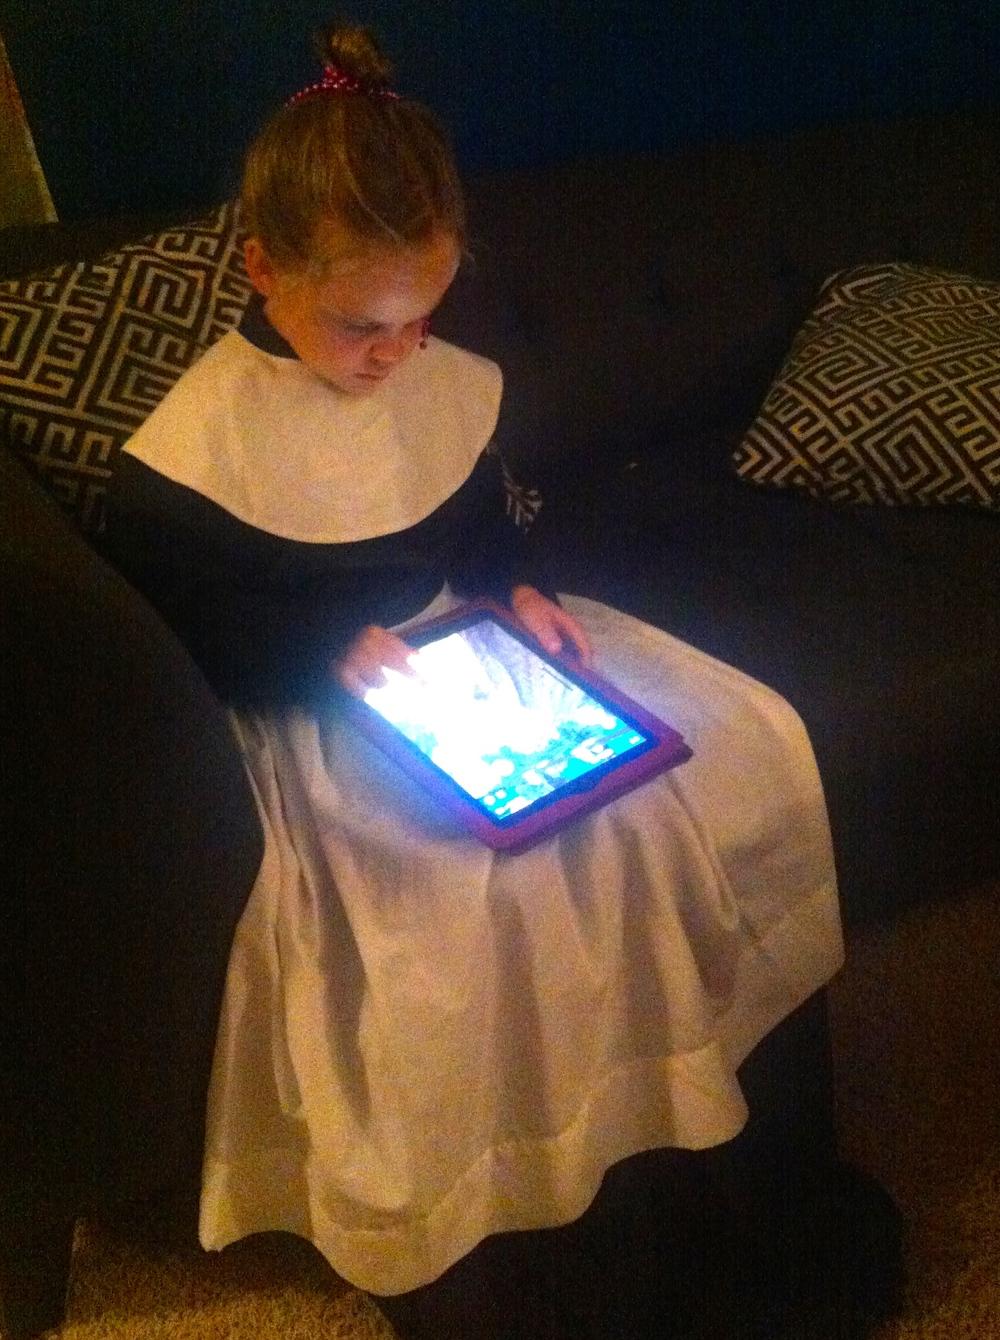 a little pilgrim playing iPad games